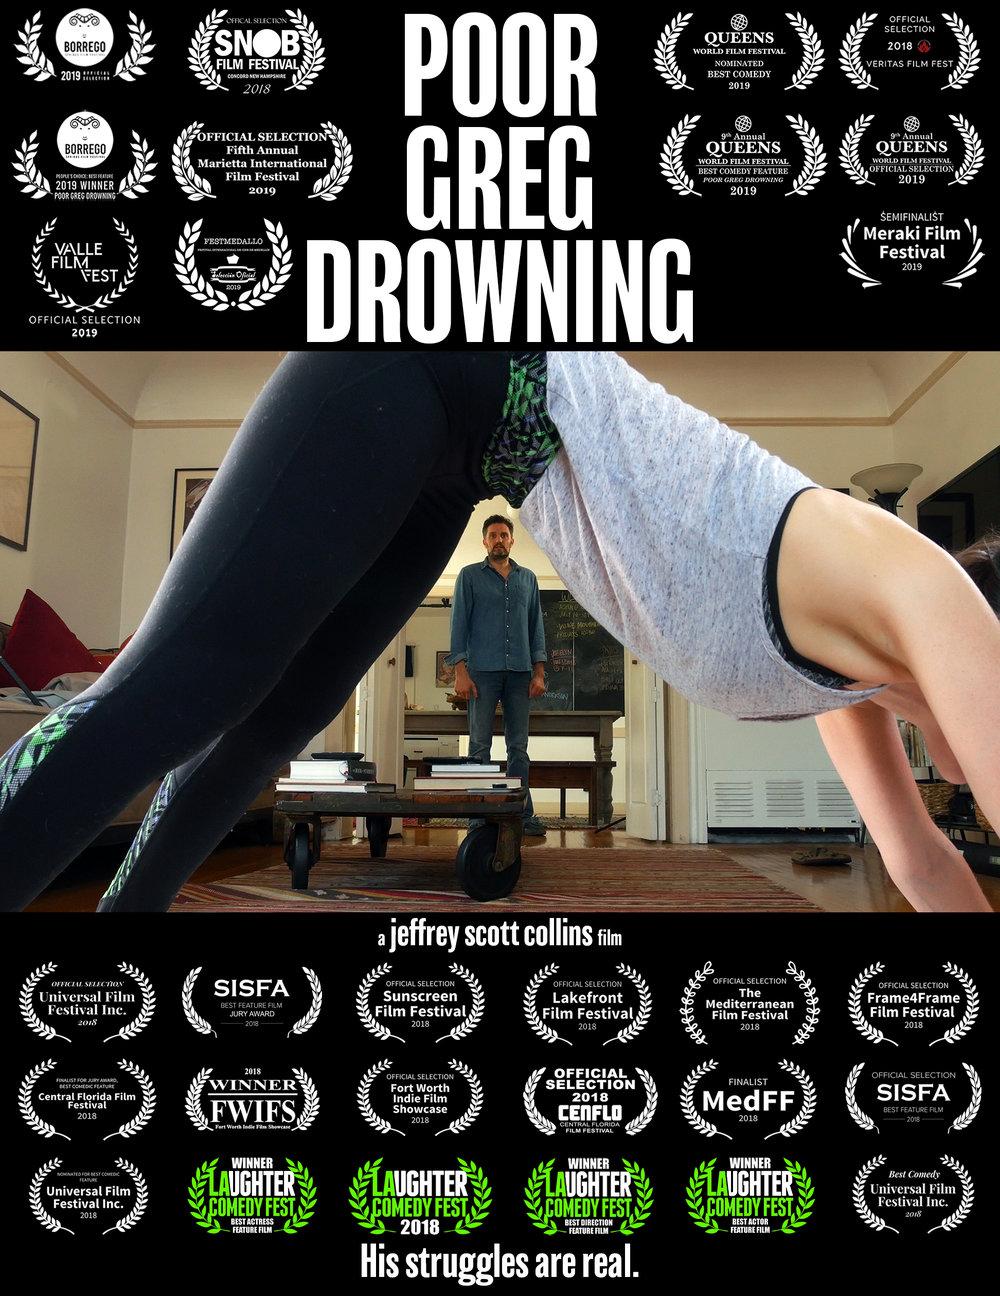 Poor Greg Drowning temp poster.jpg